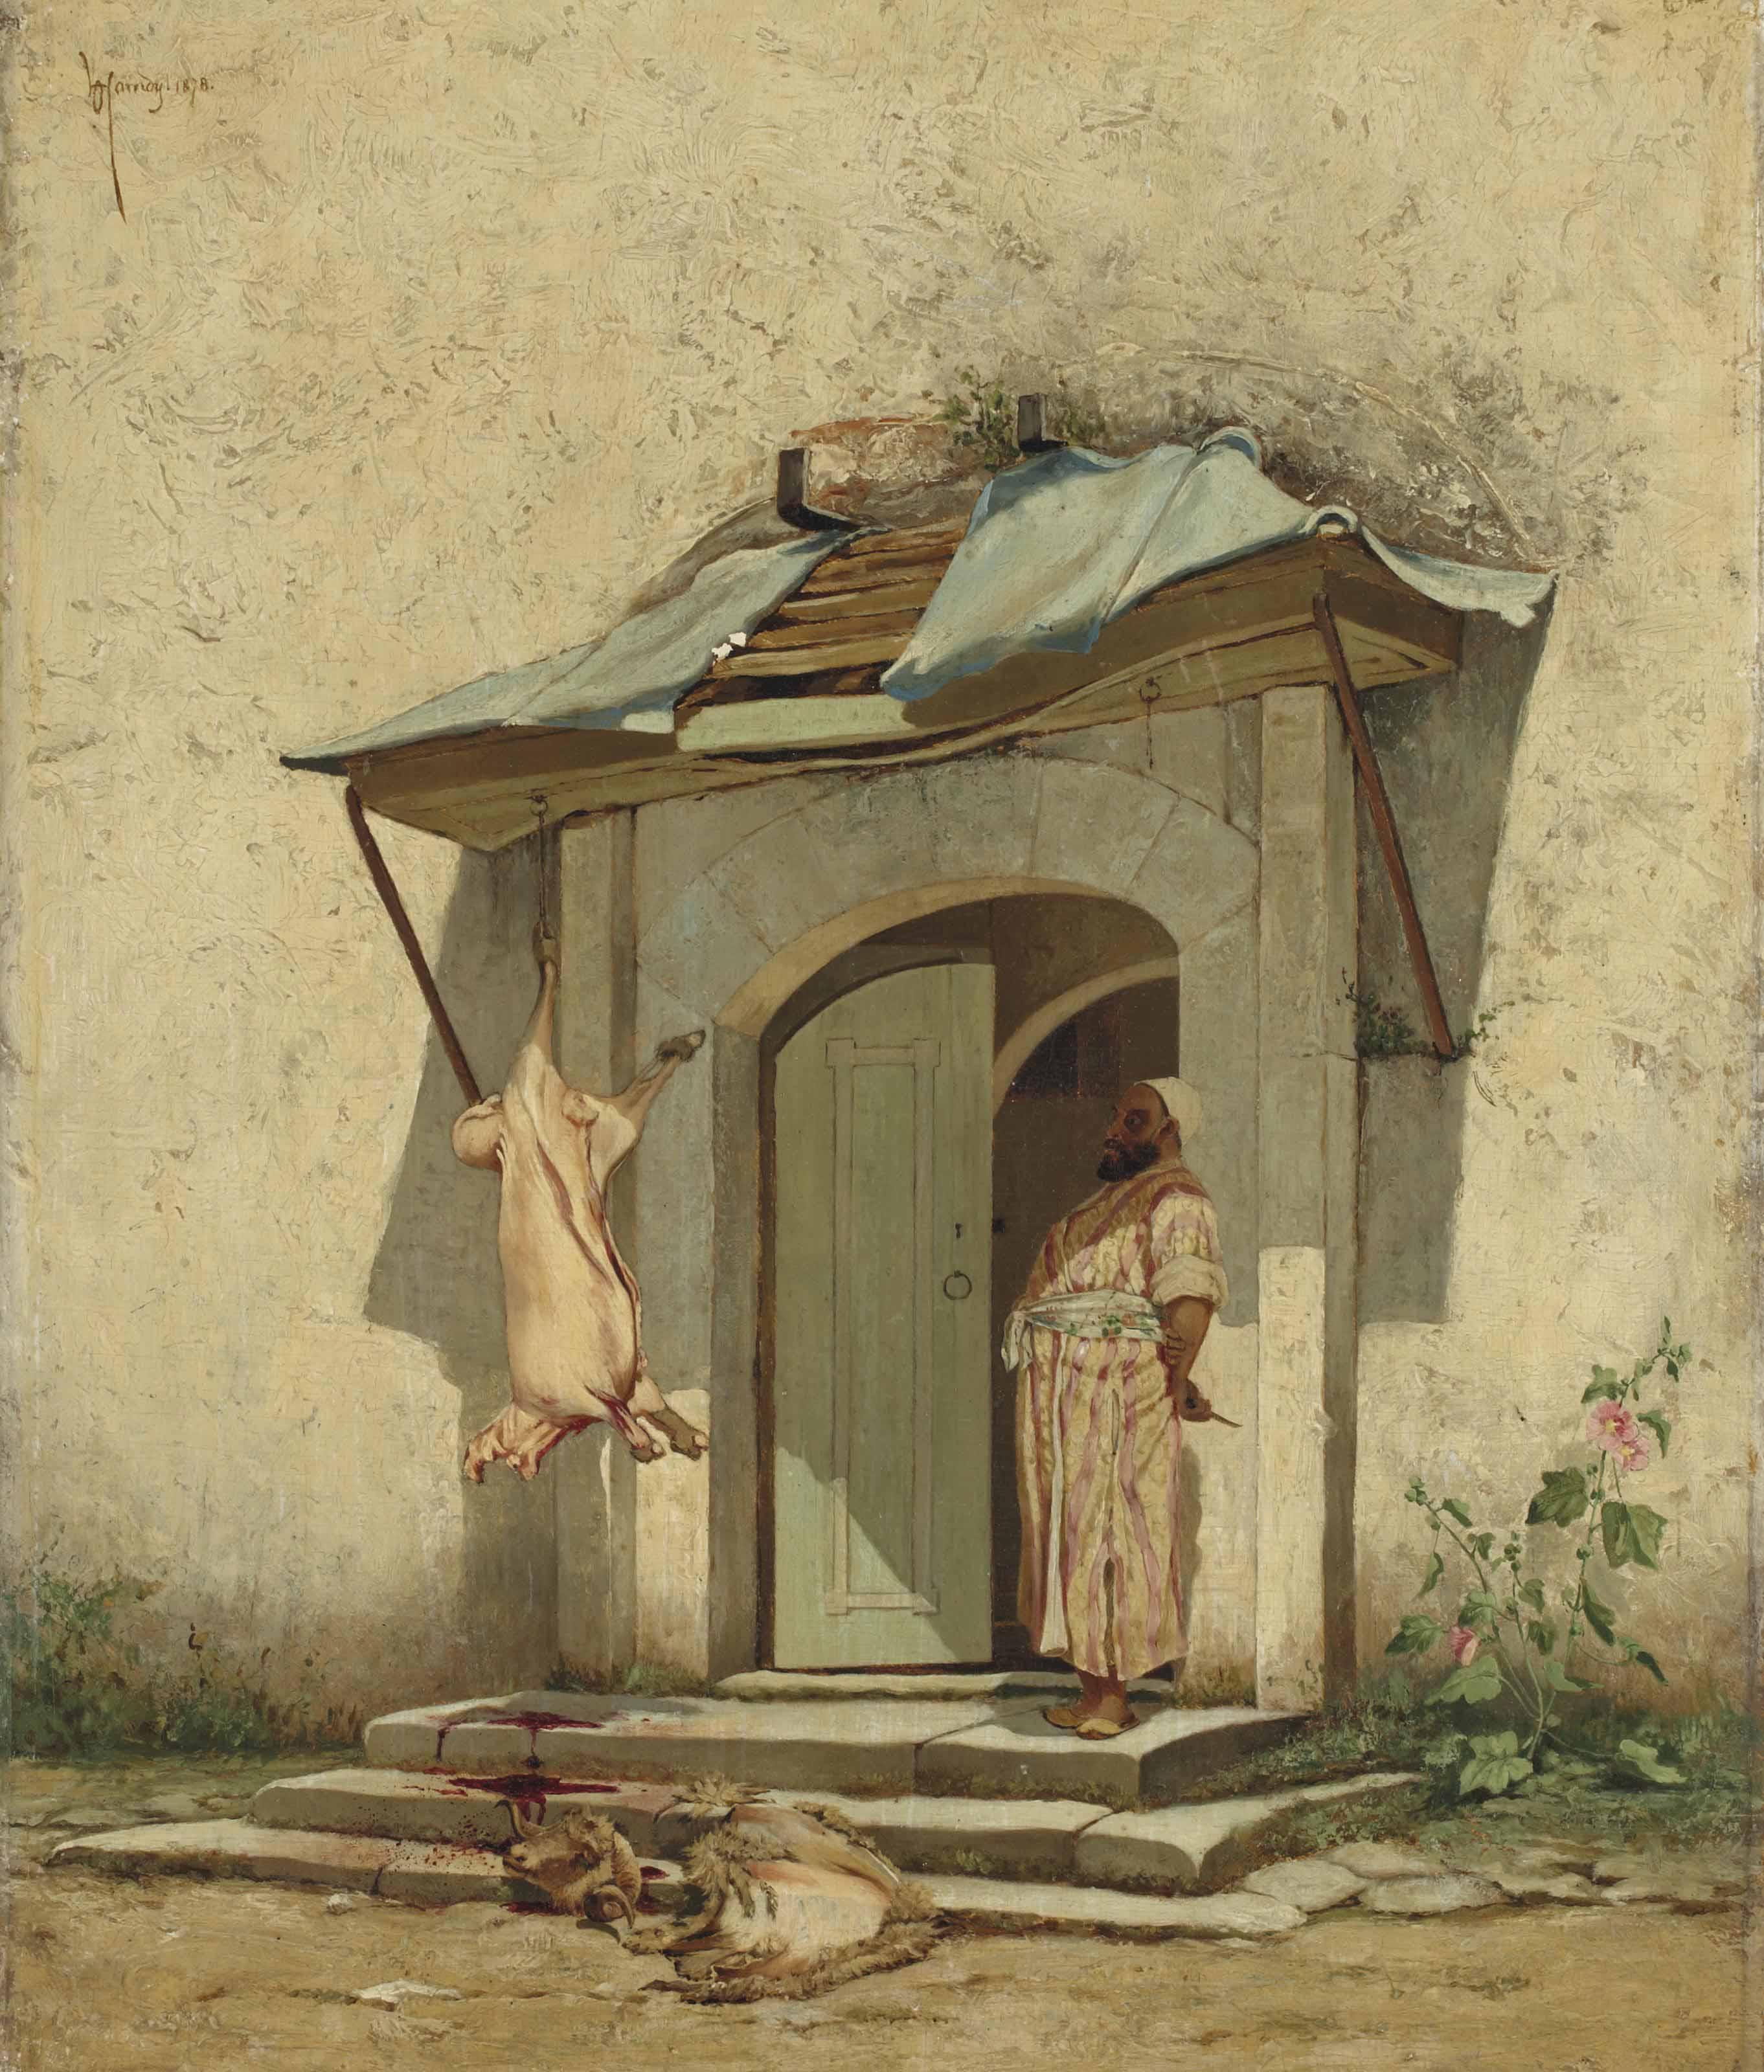 Osman Hamdi Bey (Turkish, 1842